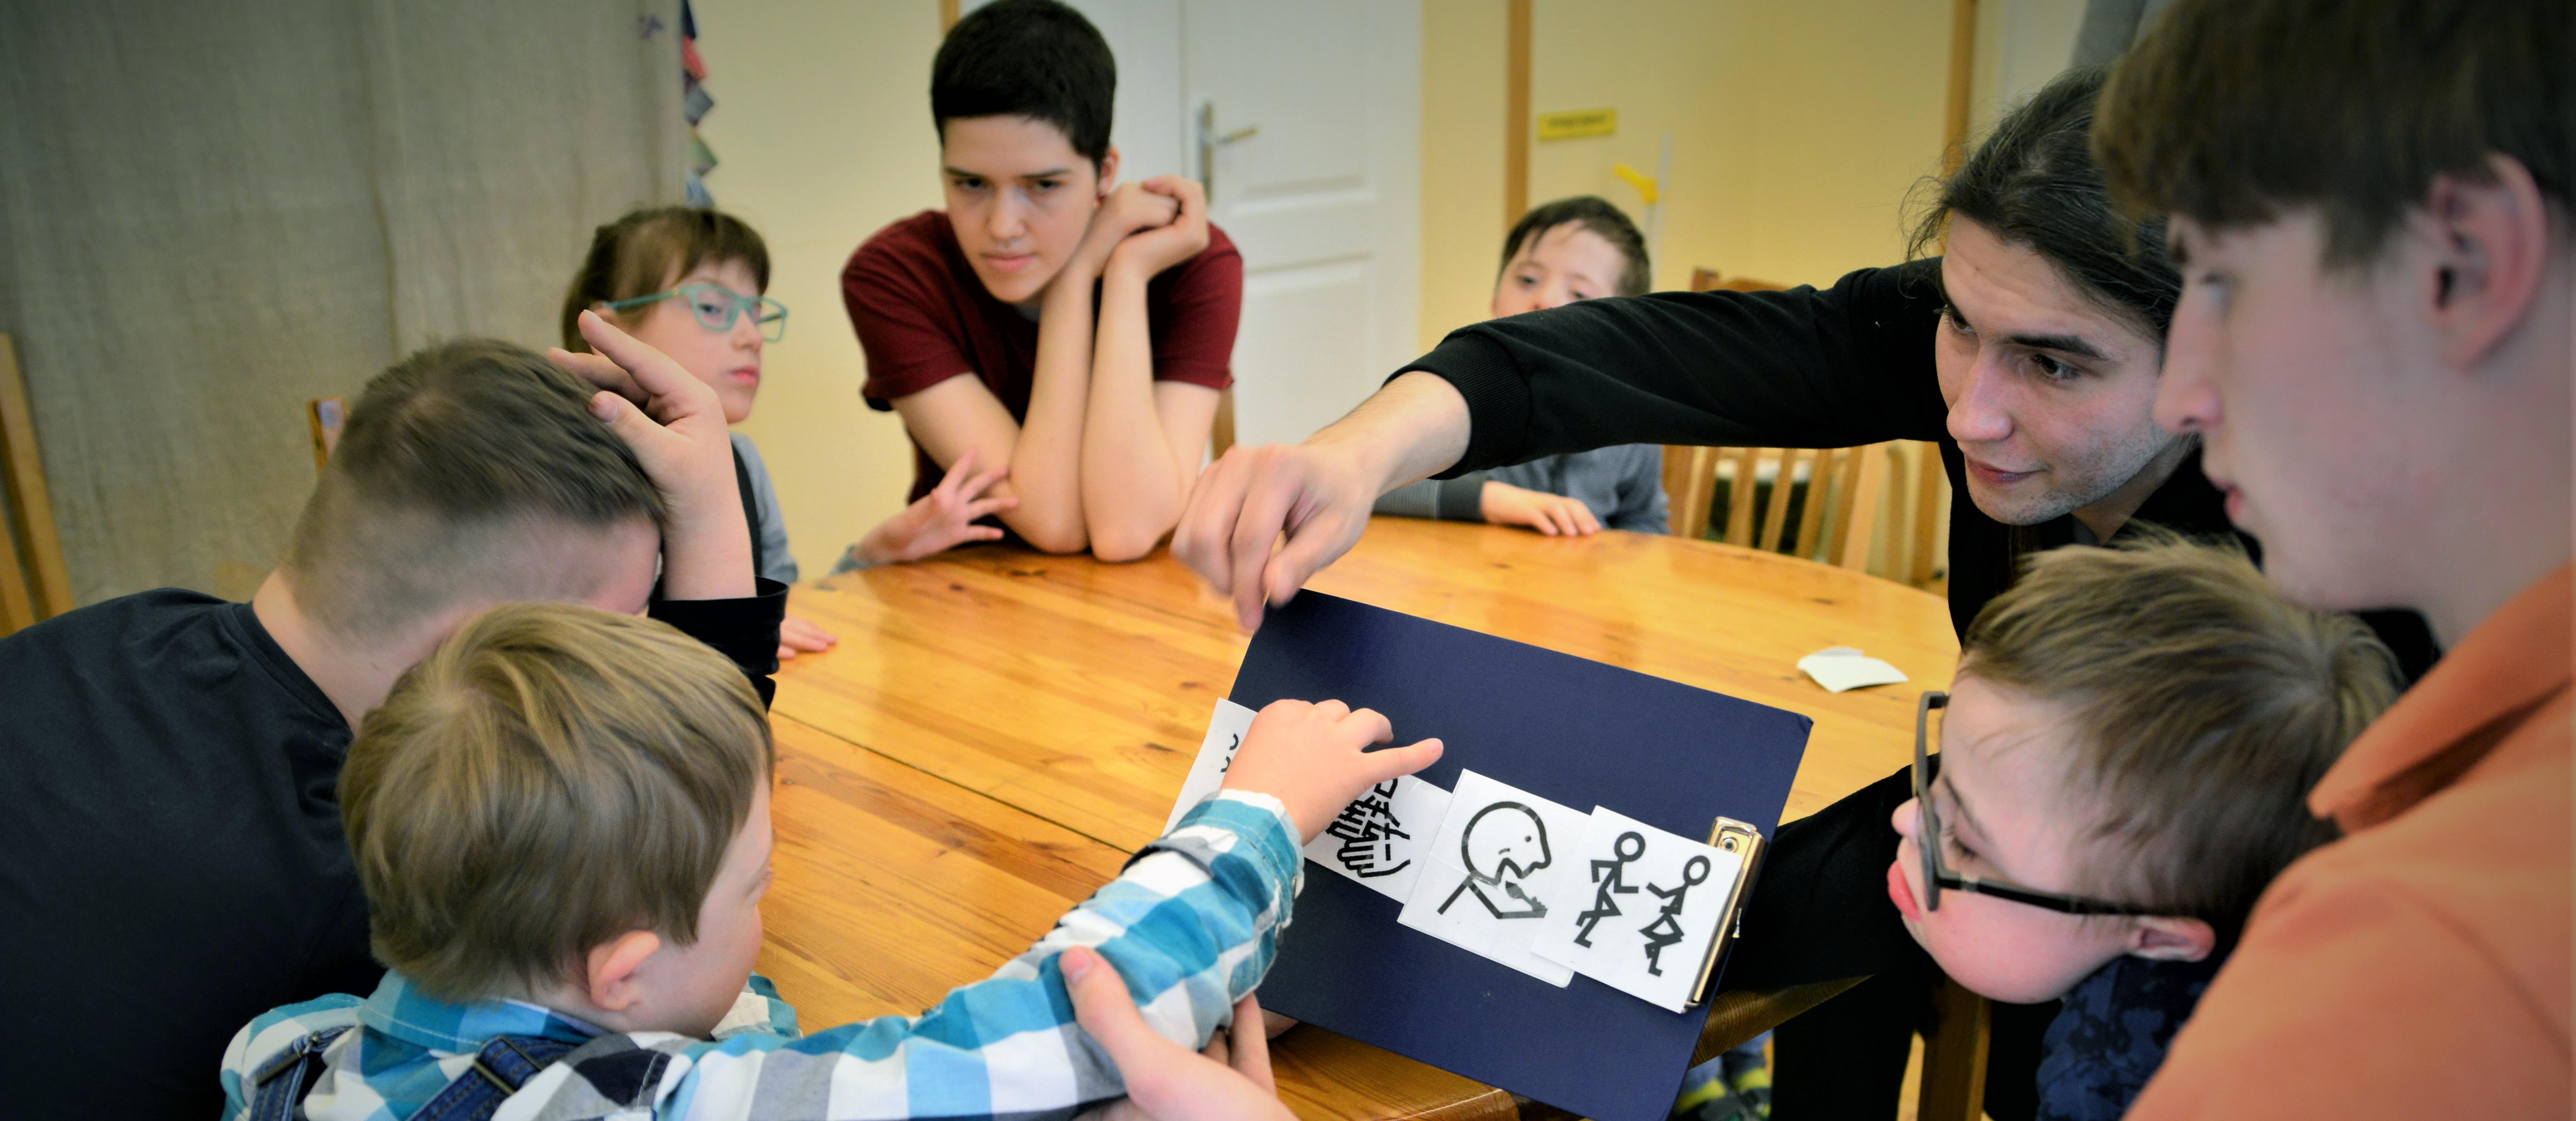 Programme Changer une Vie 2 en Russie - enfants en situation de handicap